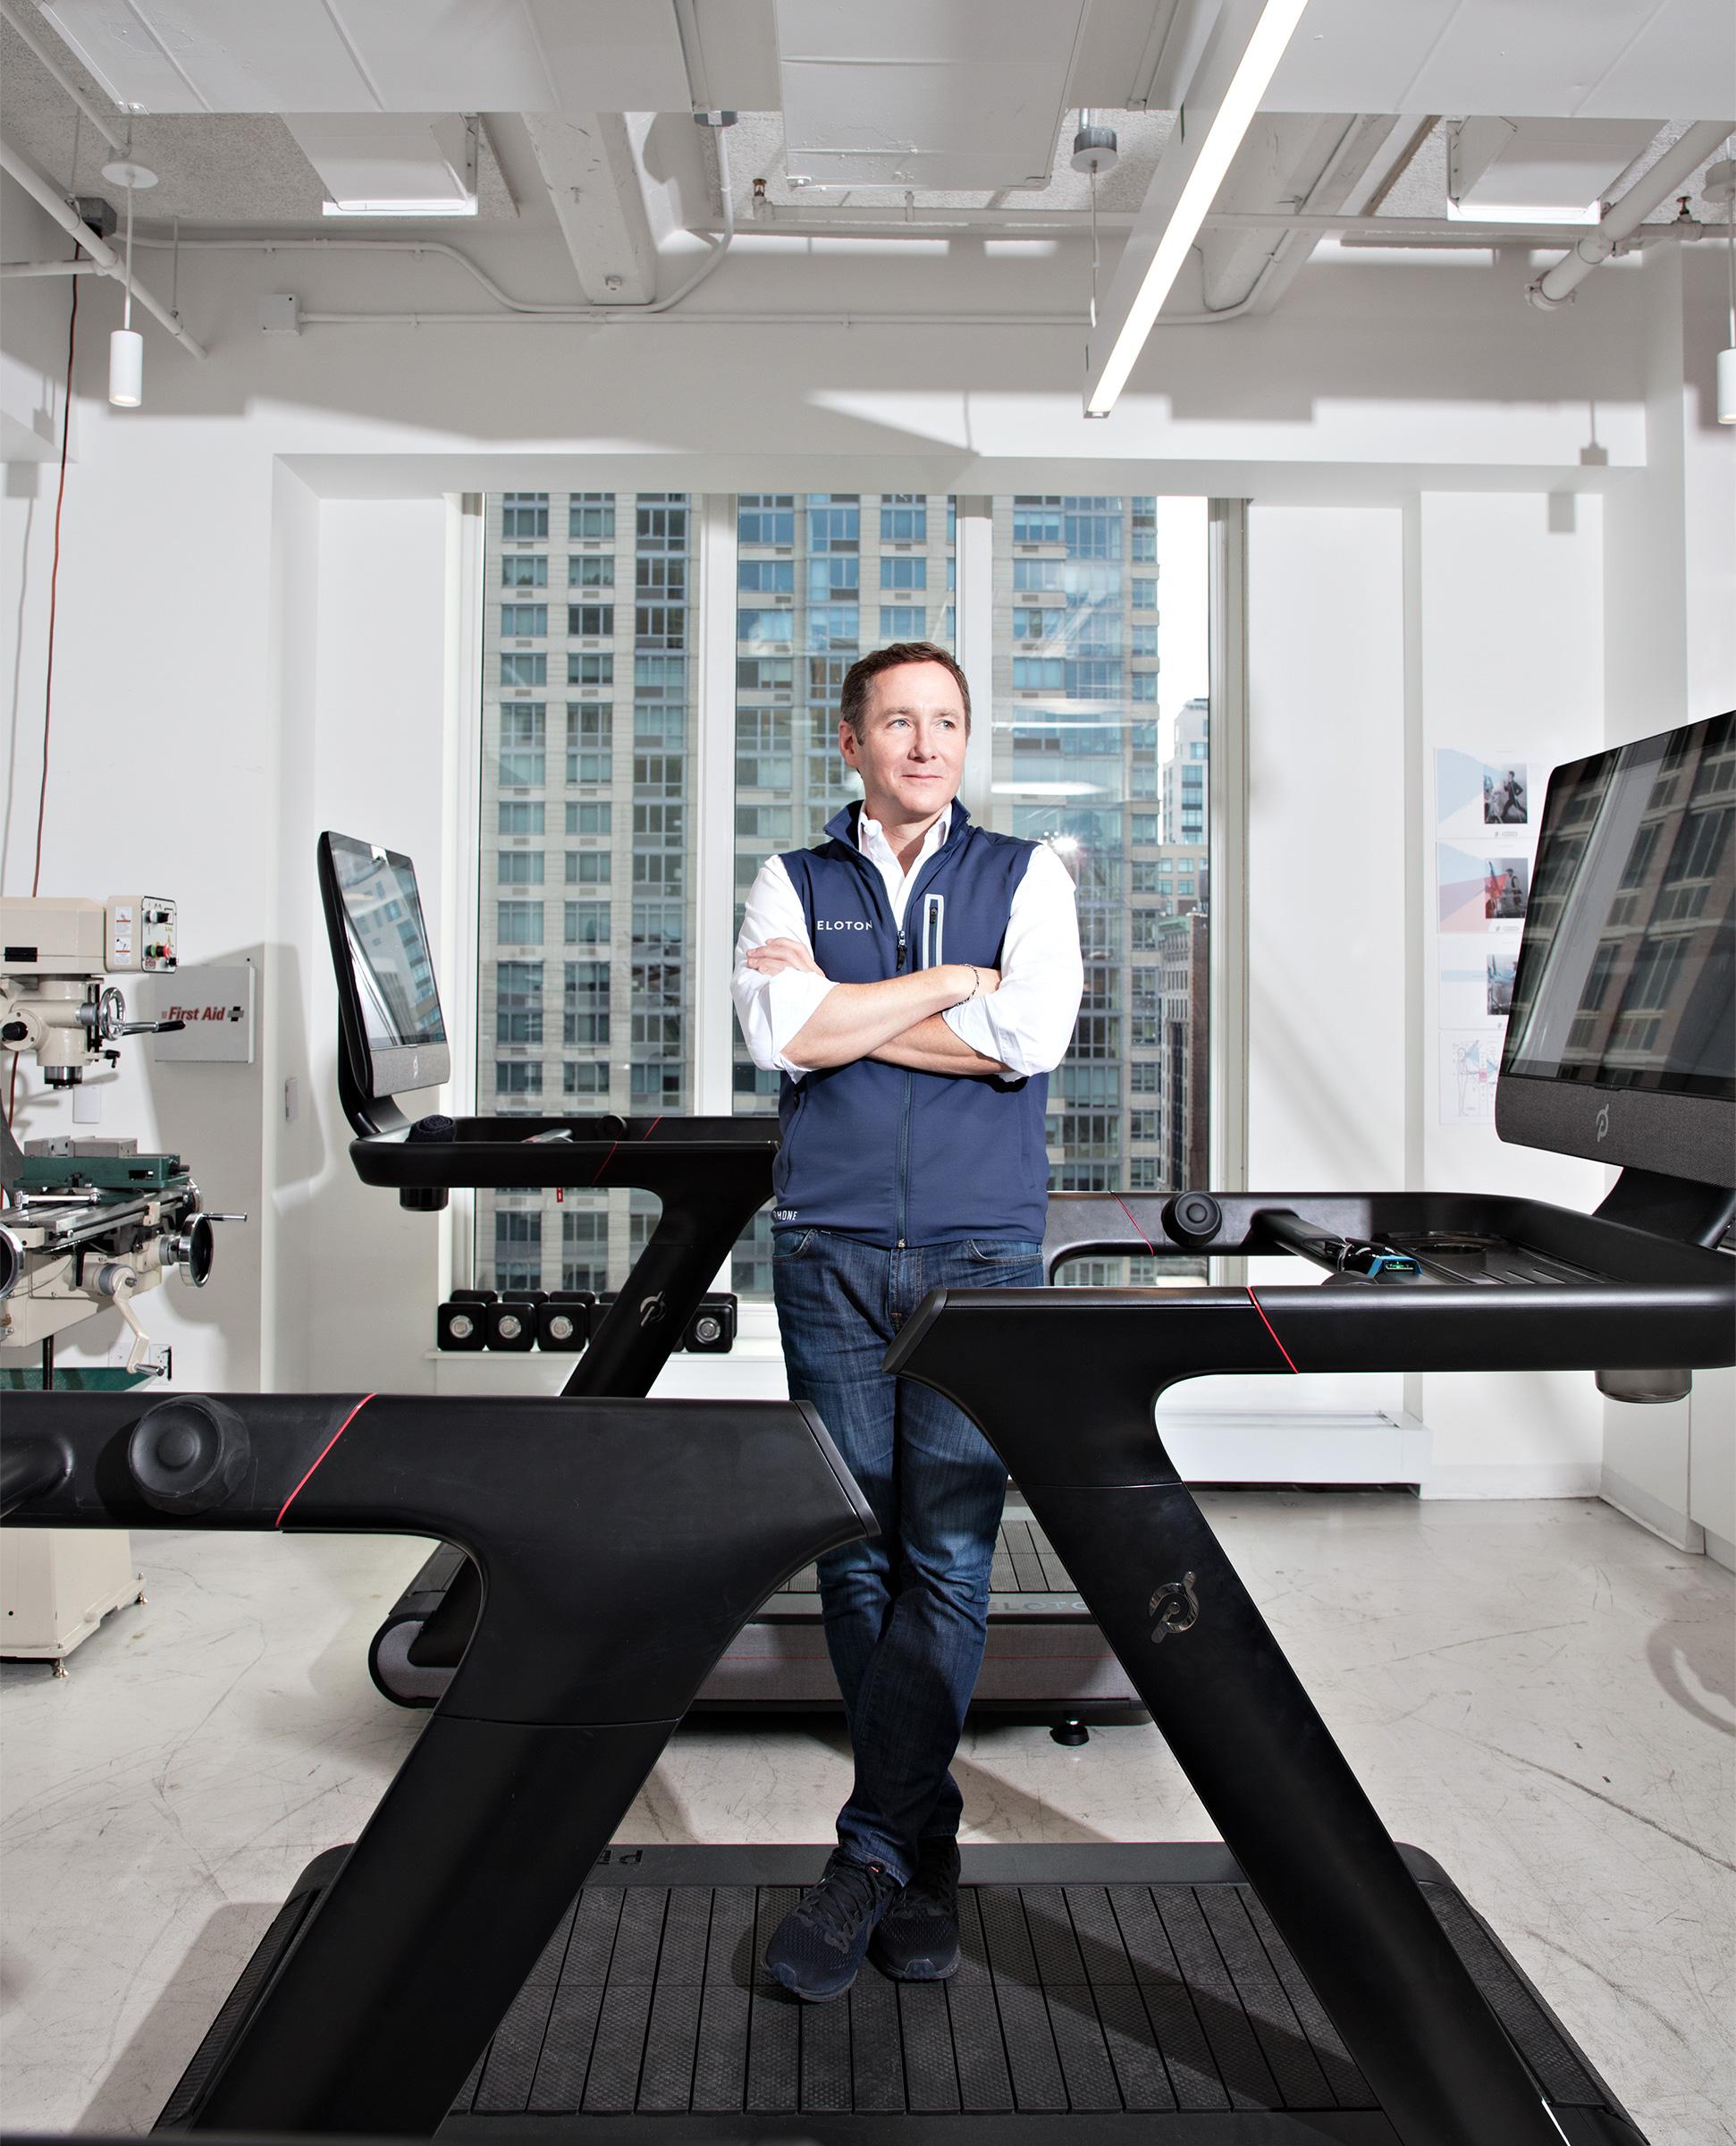 John Foley, CEO of Peloton